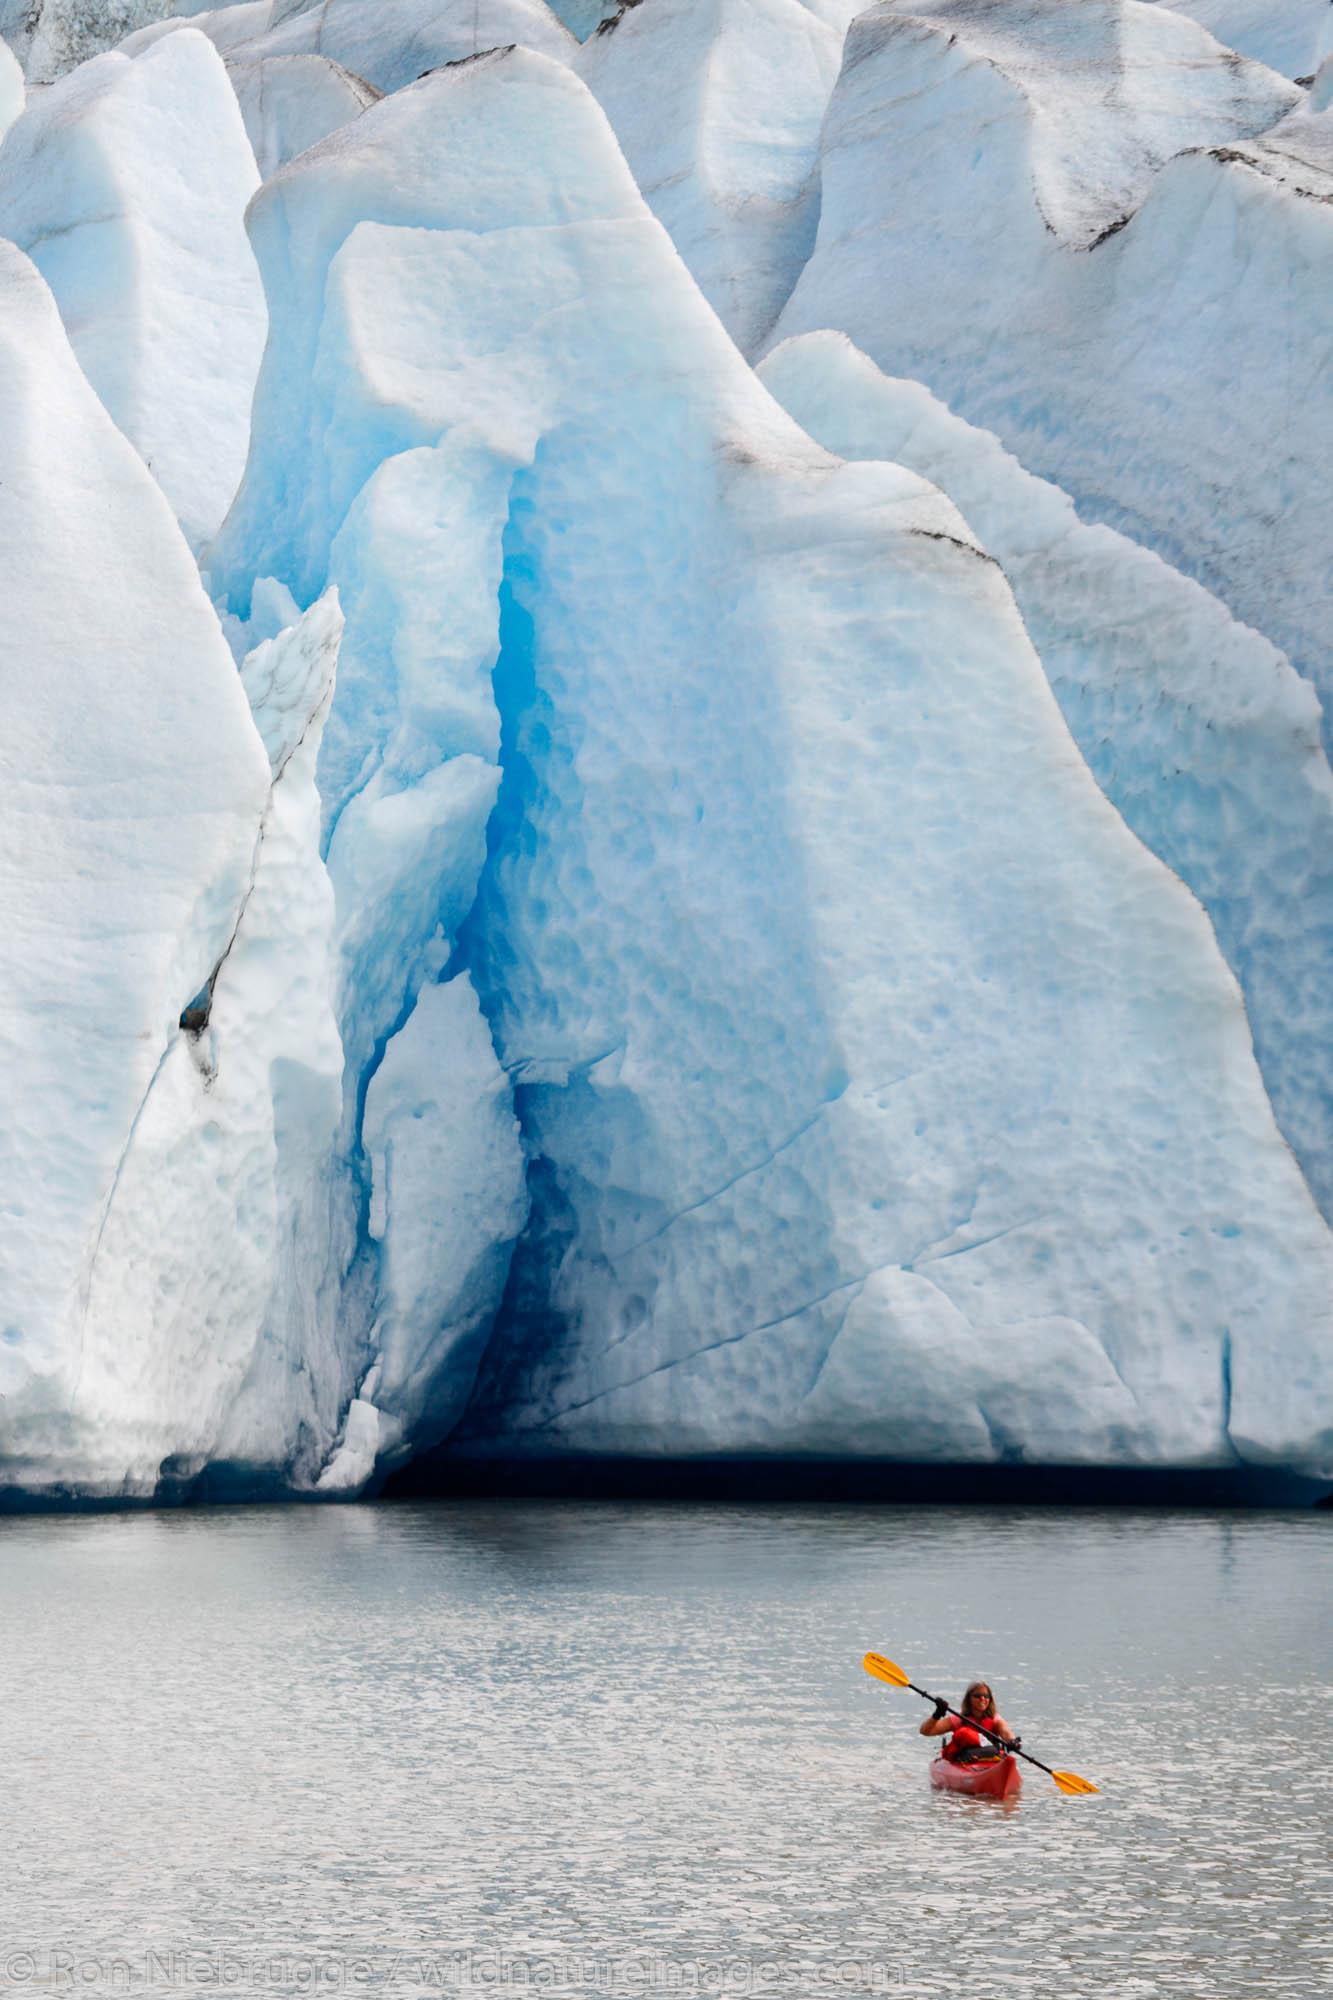 Kayaking in front of Mendenhall Glacier on Mendenhall Lake, Juneau, Alaska.